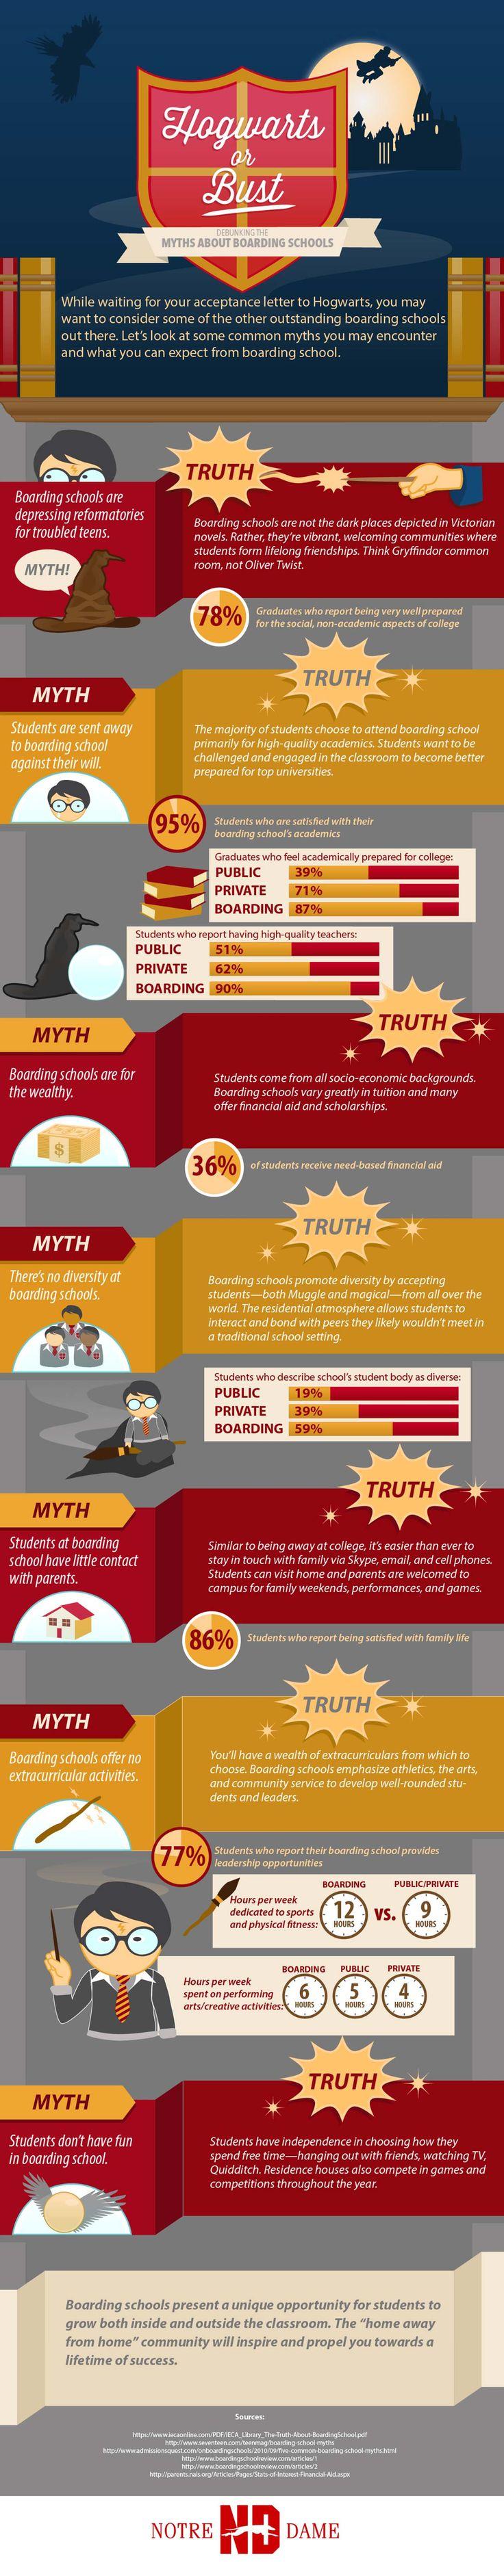 Hogwarts or Bust: Boarding School Myths and Truths #infographic #Education #BoardingSchool